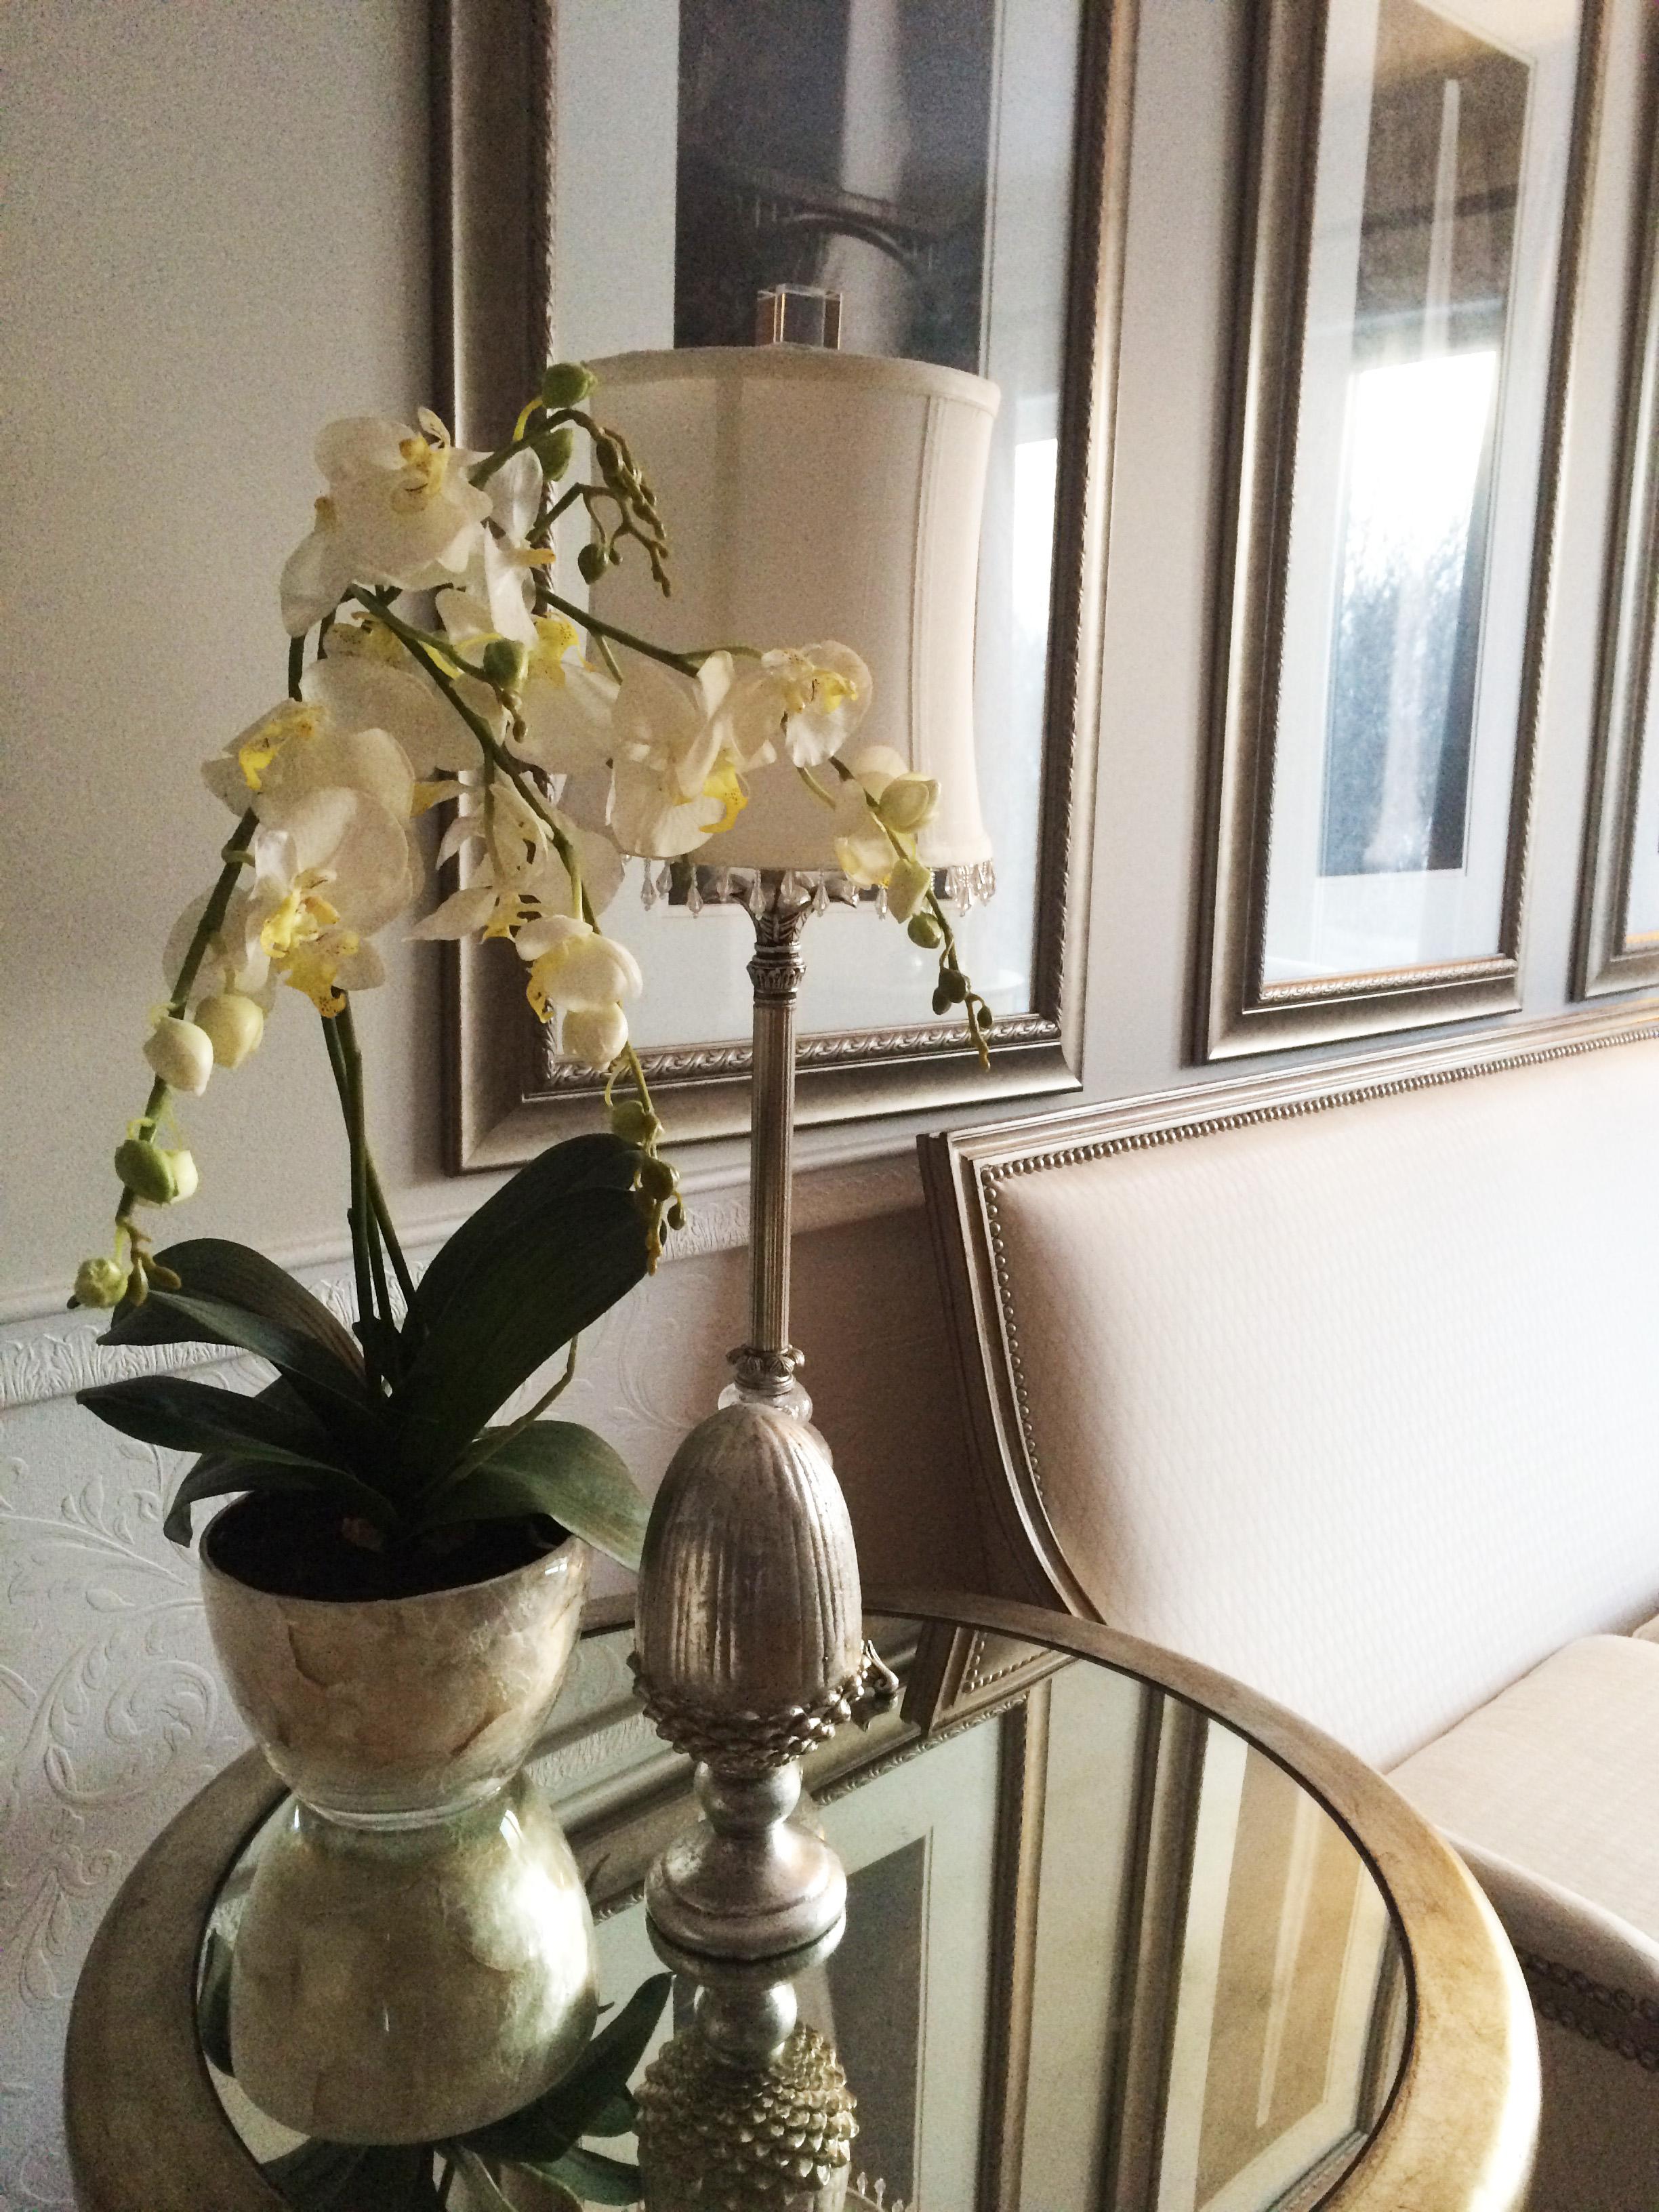 Residential Home Design - Decor